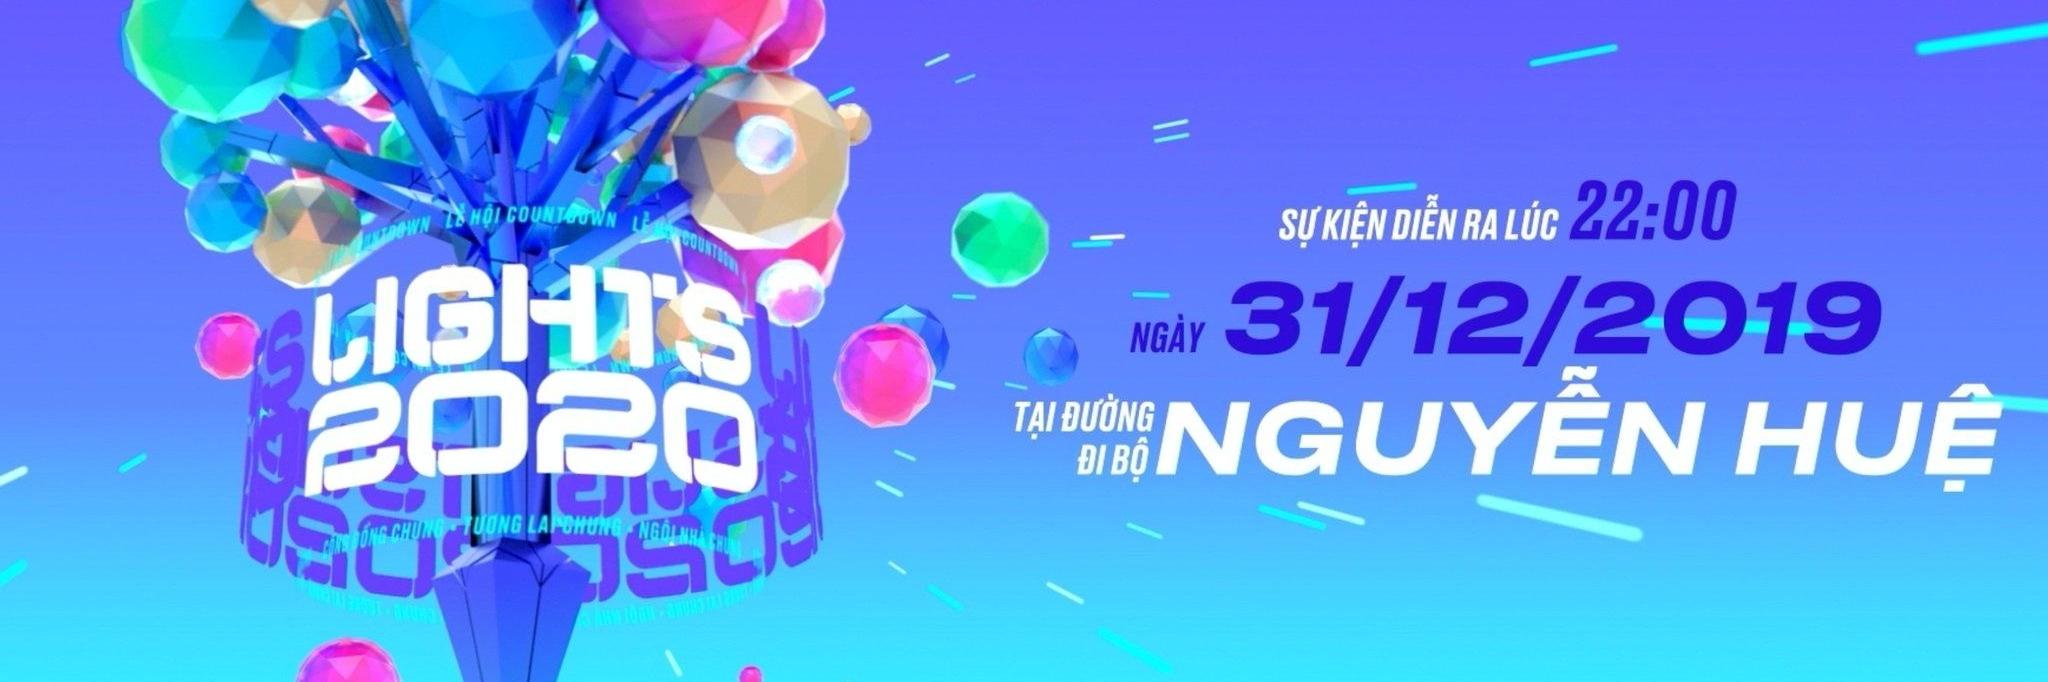 https://gody.vn/blog/quynhnhu/post/countdown-2020-le-hoi-dem-nguoc-chao-don-nam-moi-tai-tphcm-ha-noi-da-nang-co-gi-dac-biet-6114